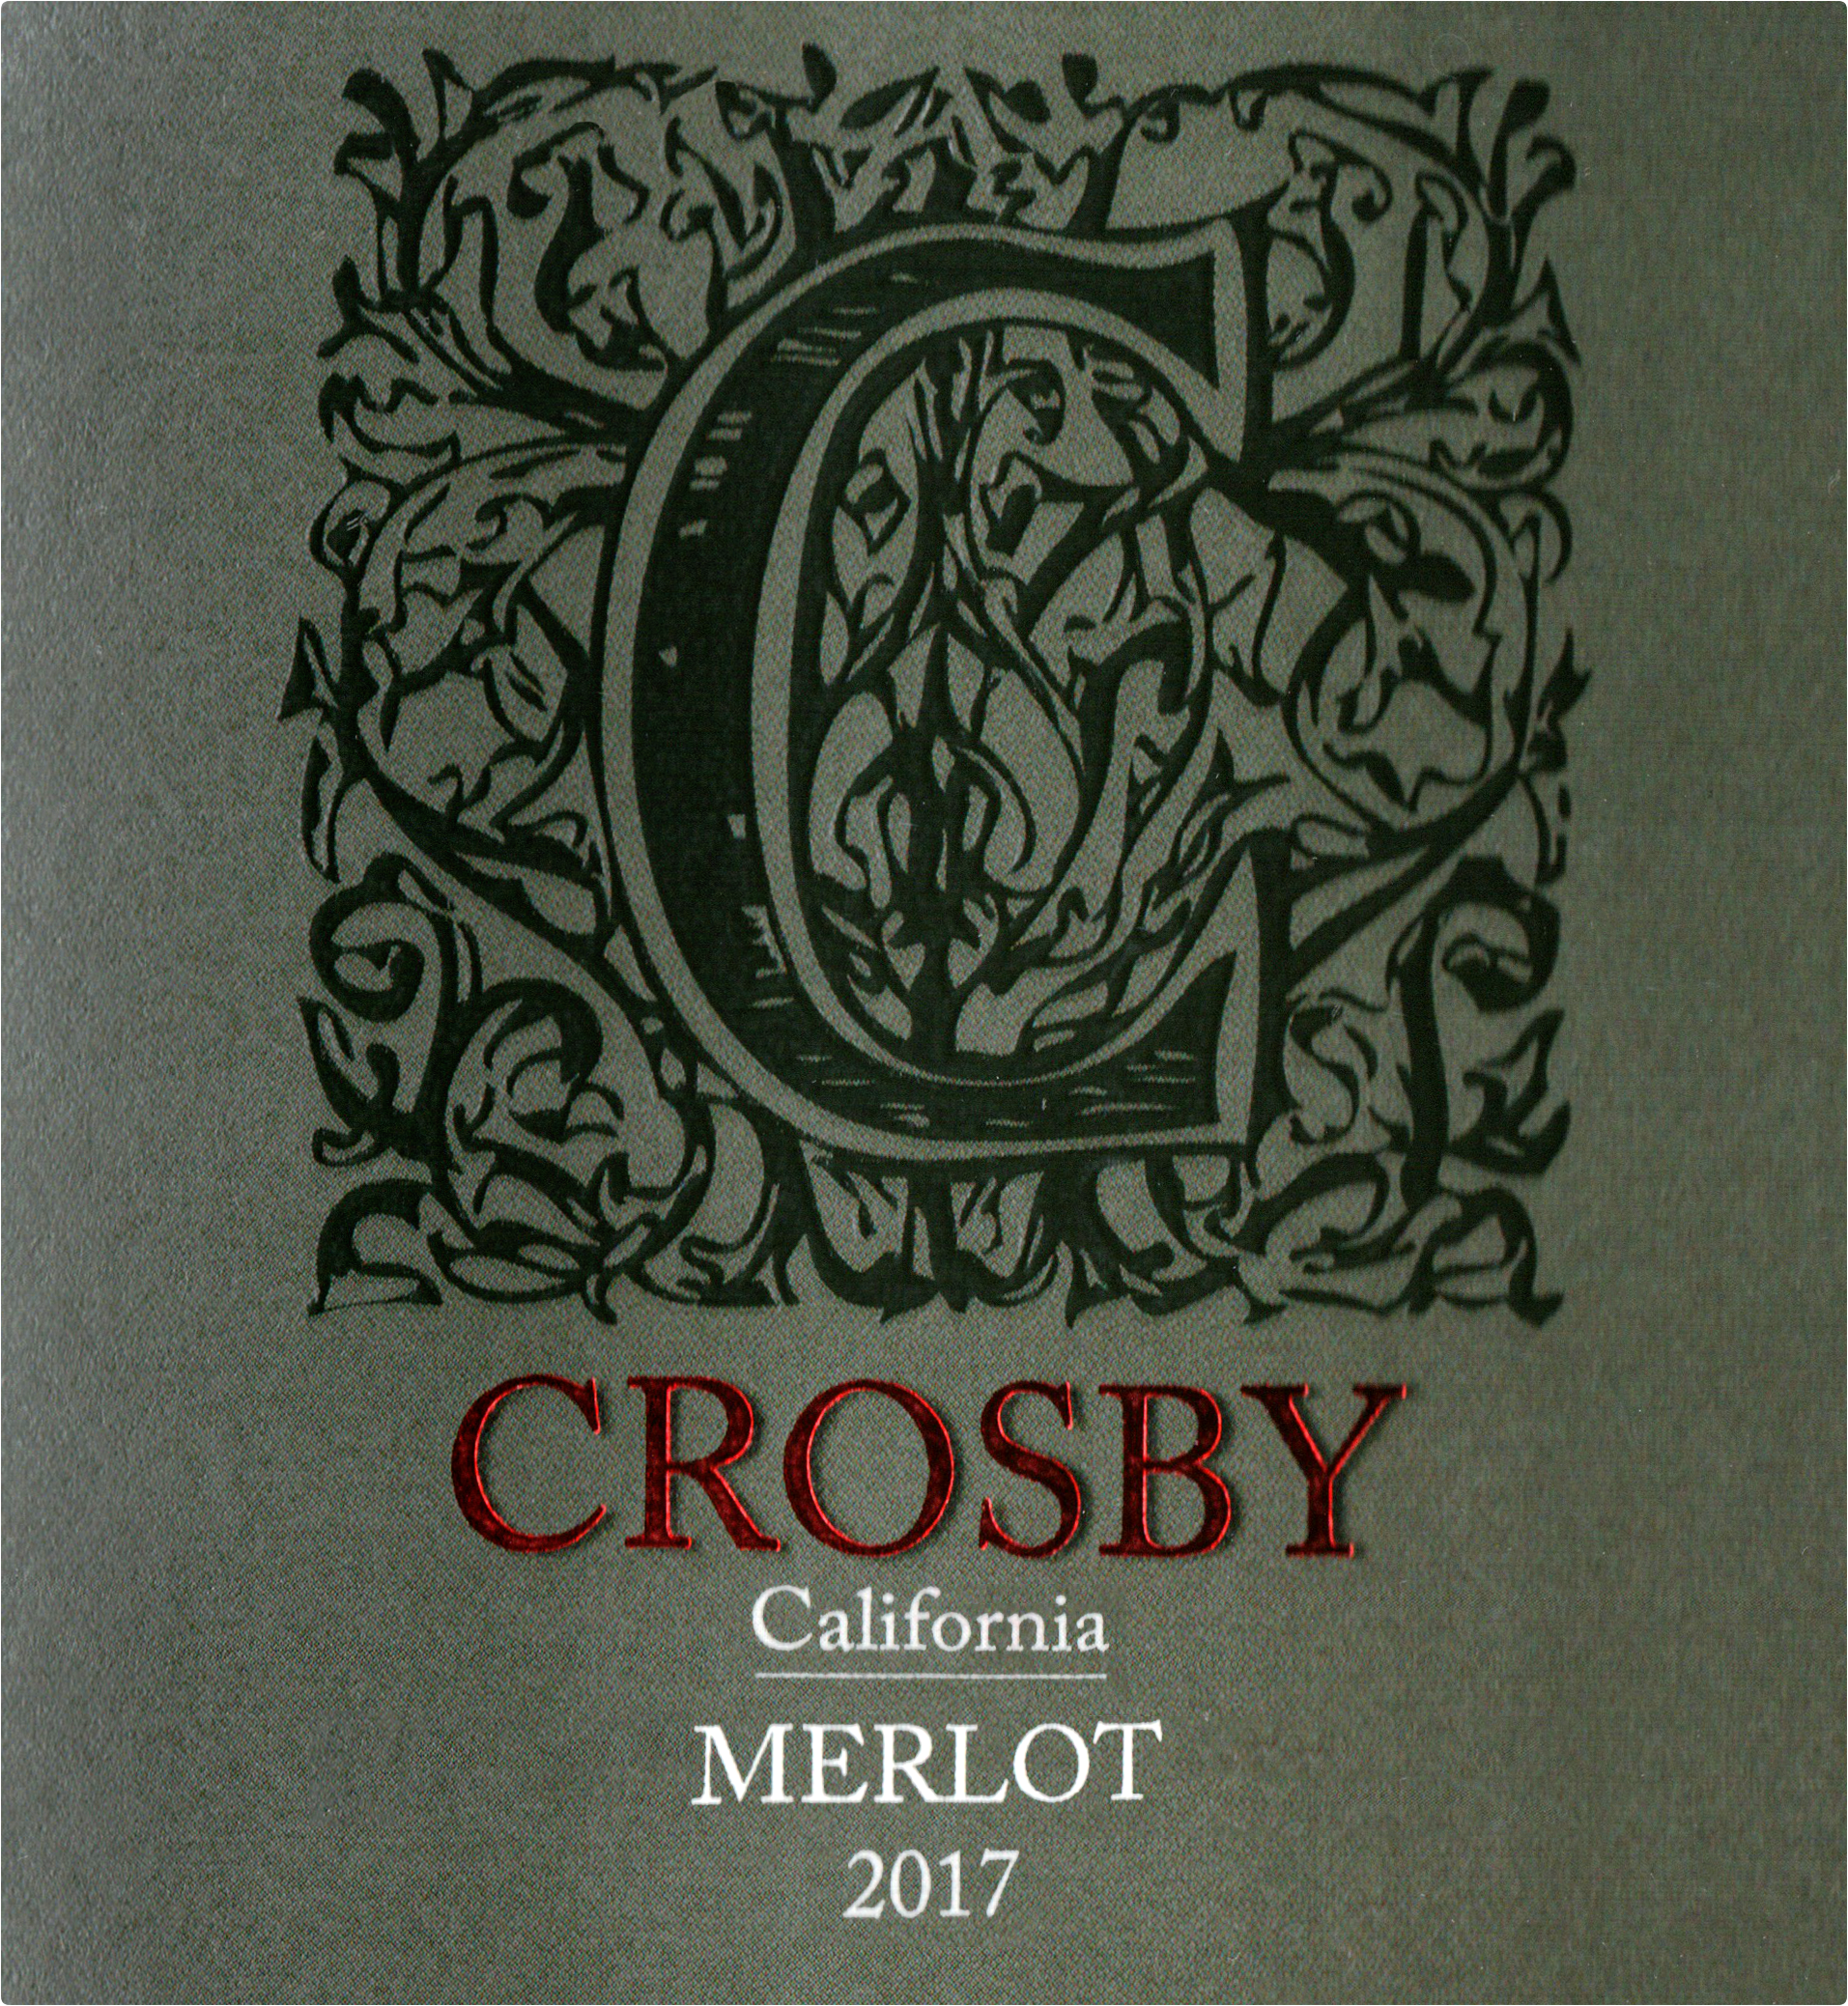 Crosby Merlot 2017